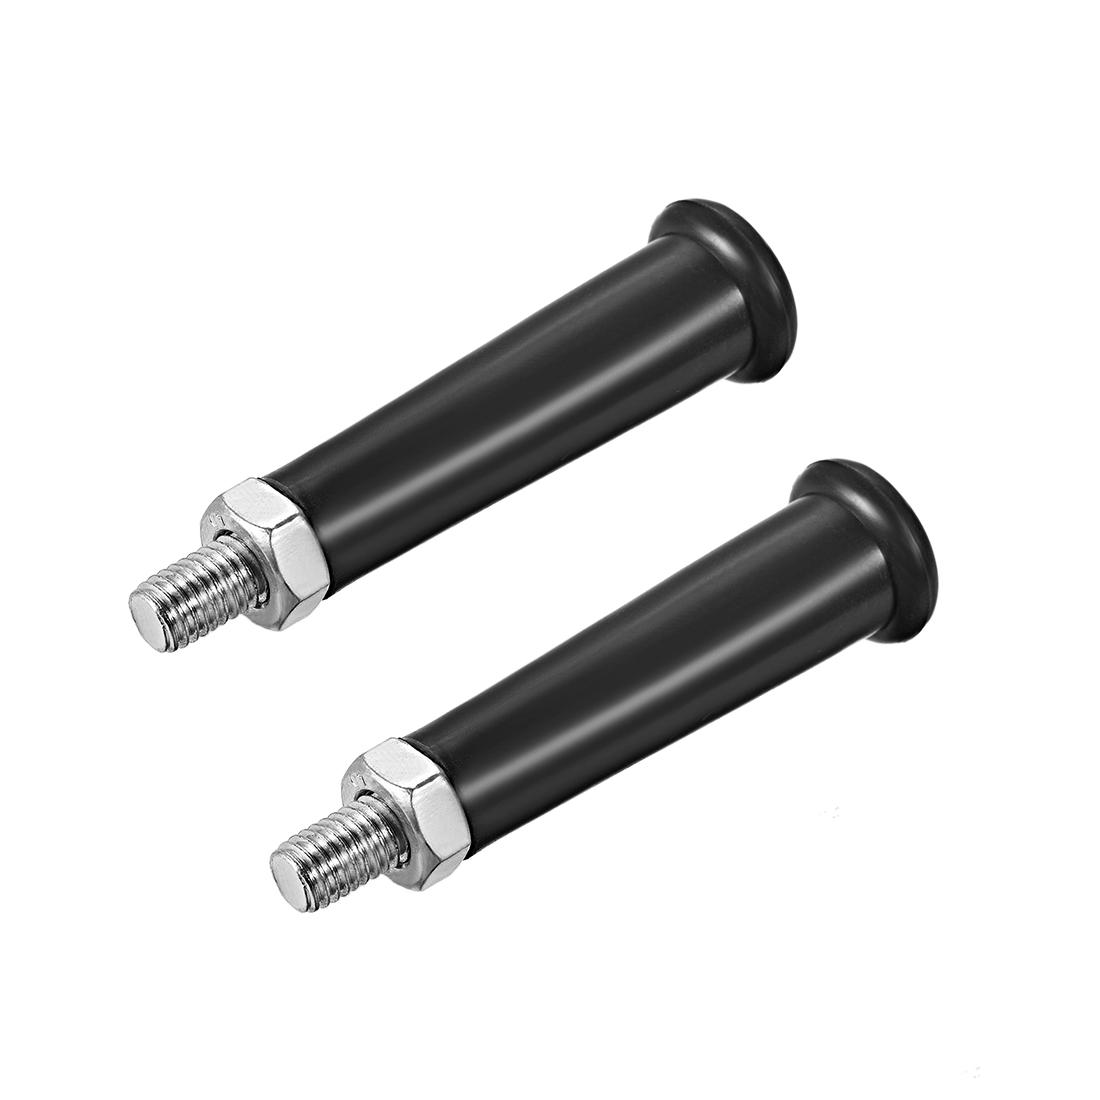 Clamping Handles Screw Knobs Handle M10 x 50mm Revolving Handle Grip 2pcs